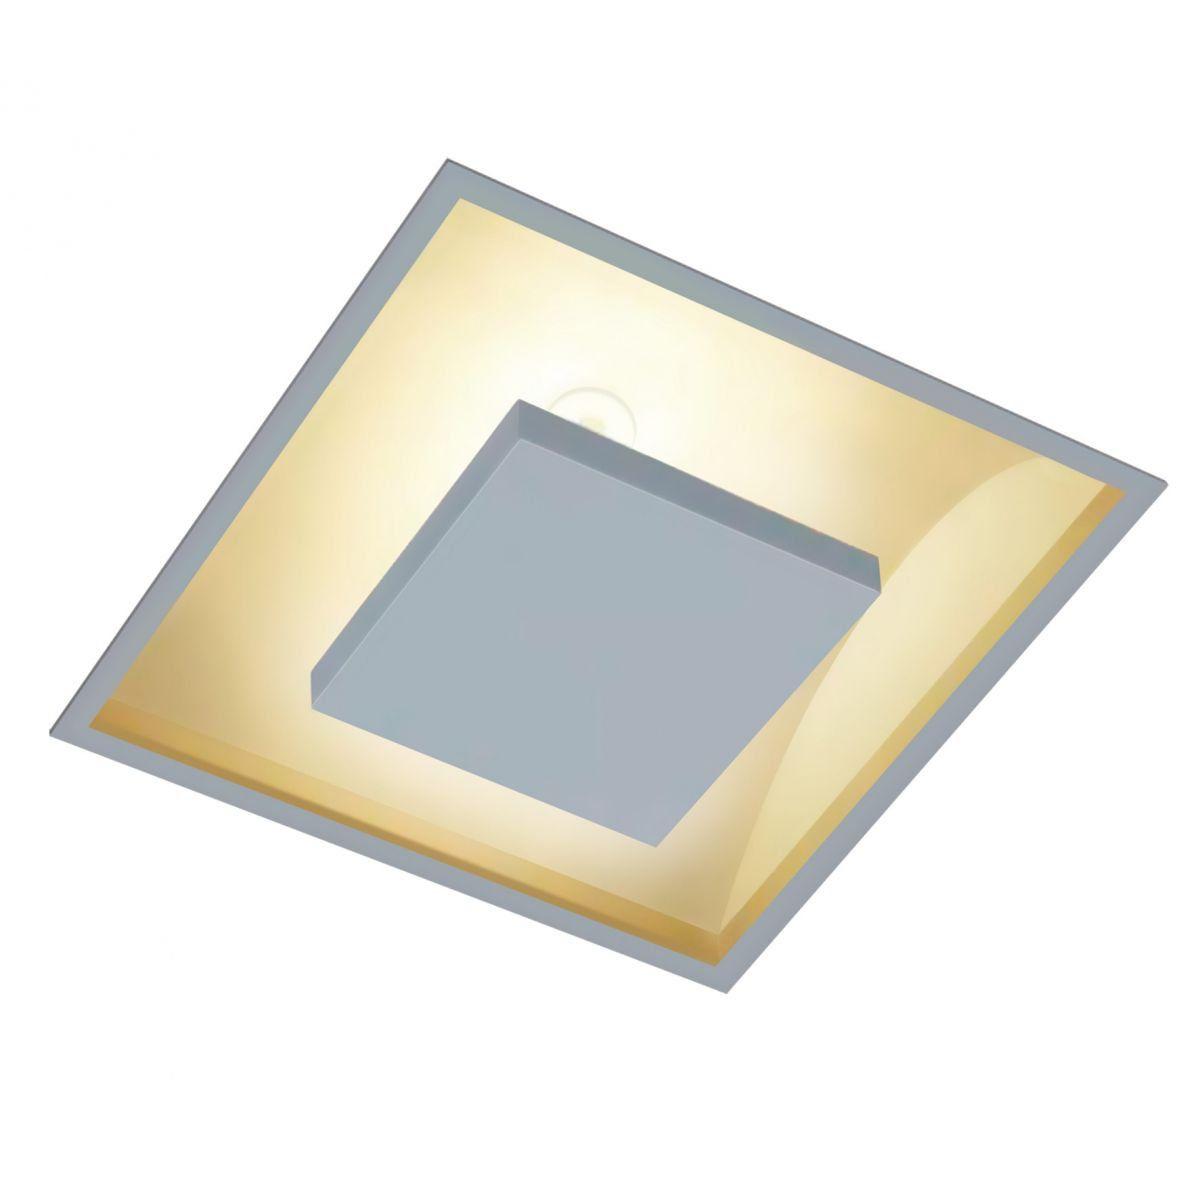 Embutido Quadrado Luz Indireta 45x45 4xG9 Branco